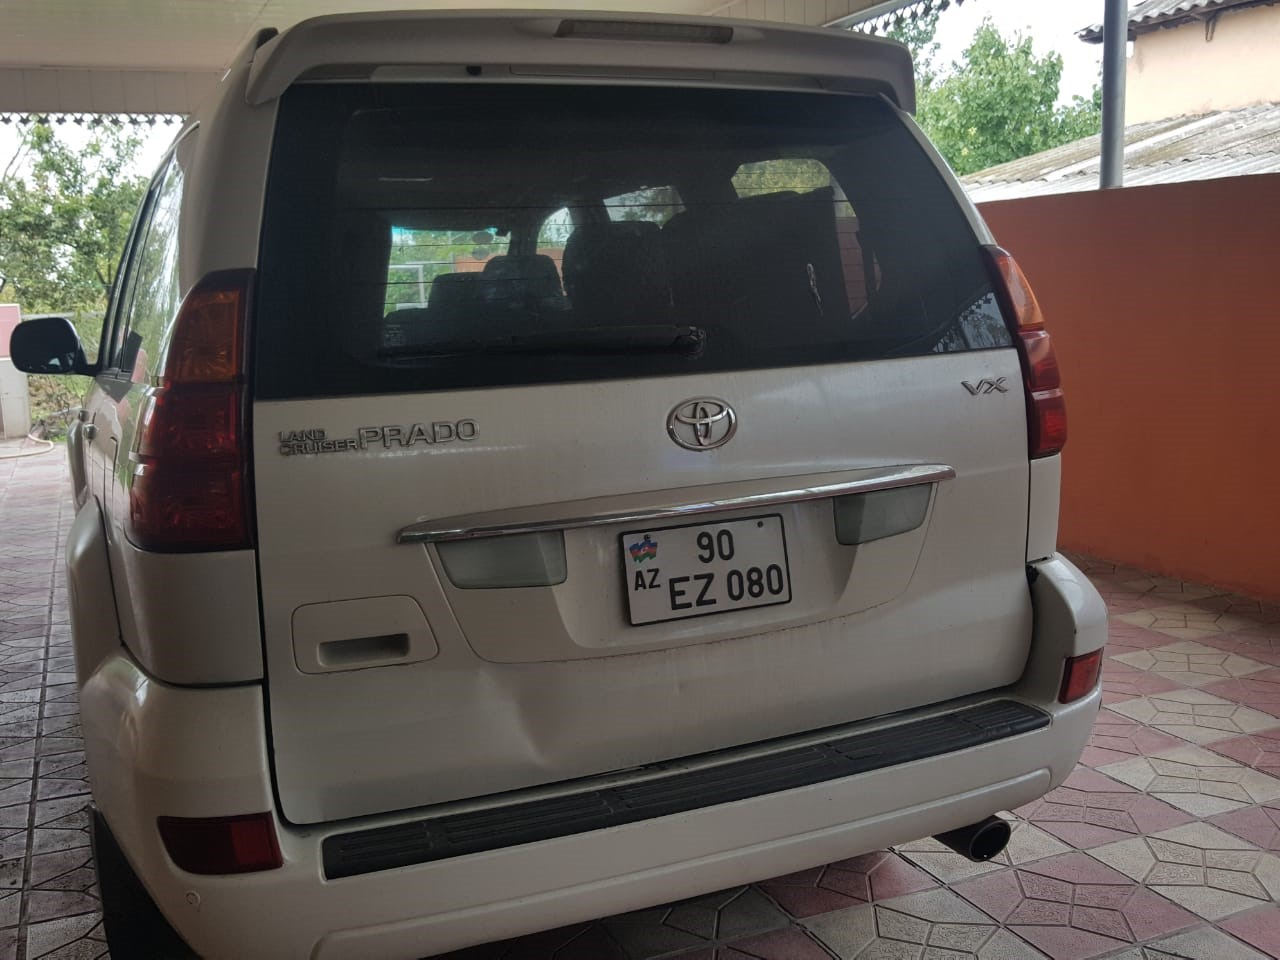 Toyota Prado 4.0(lt) 2008 İkinci əl  $18500